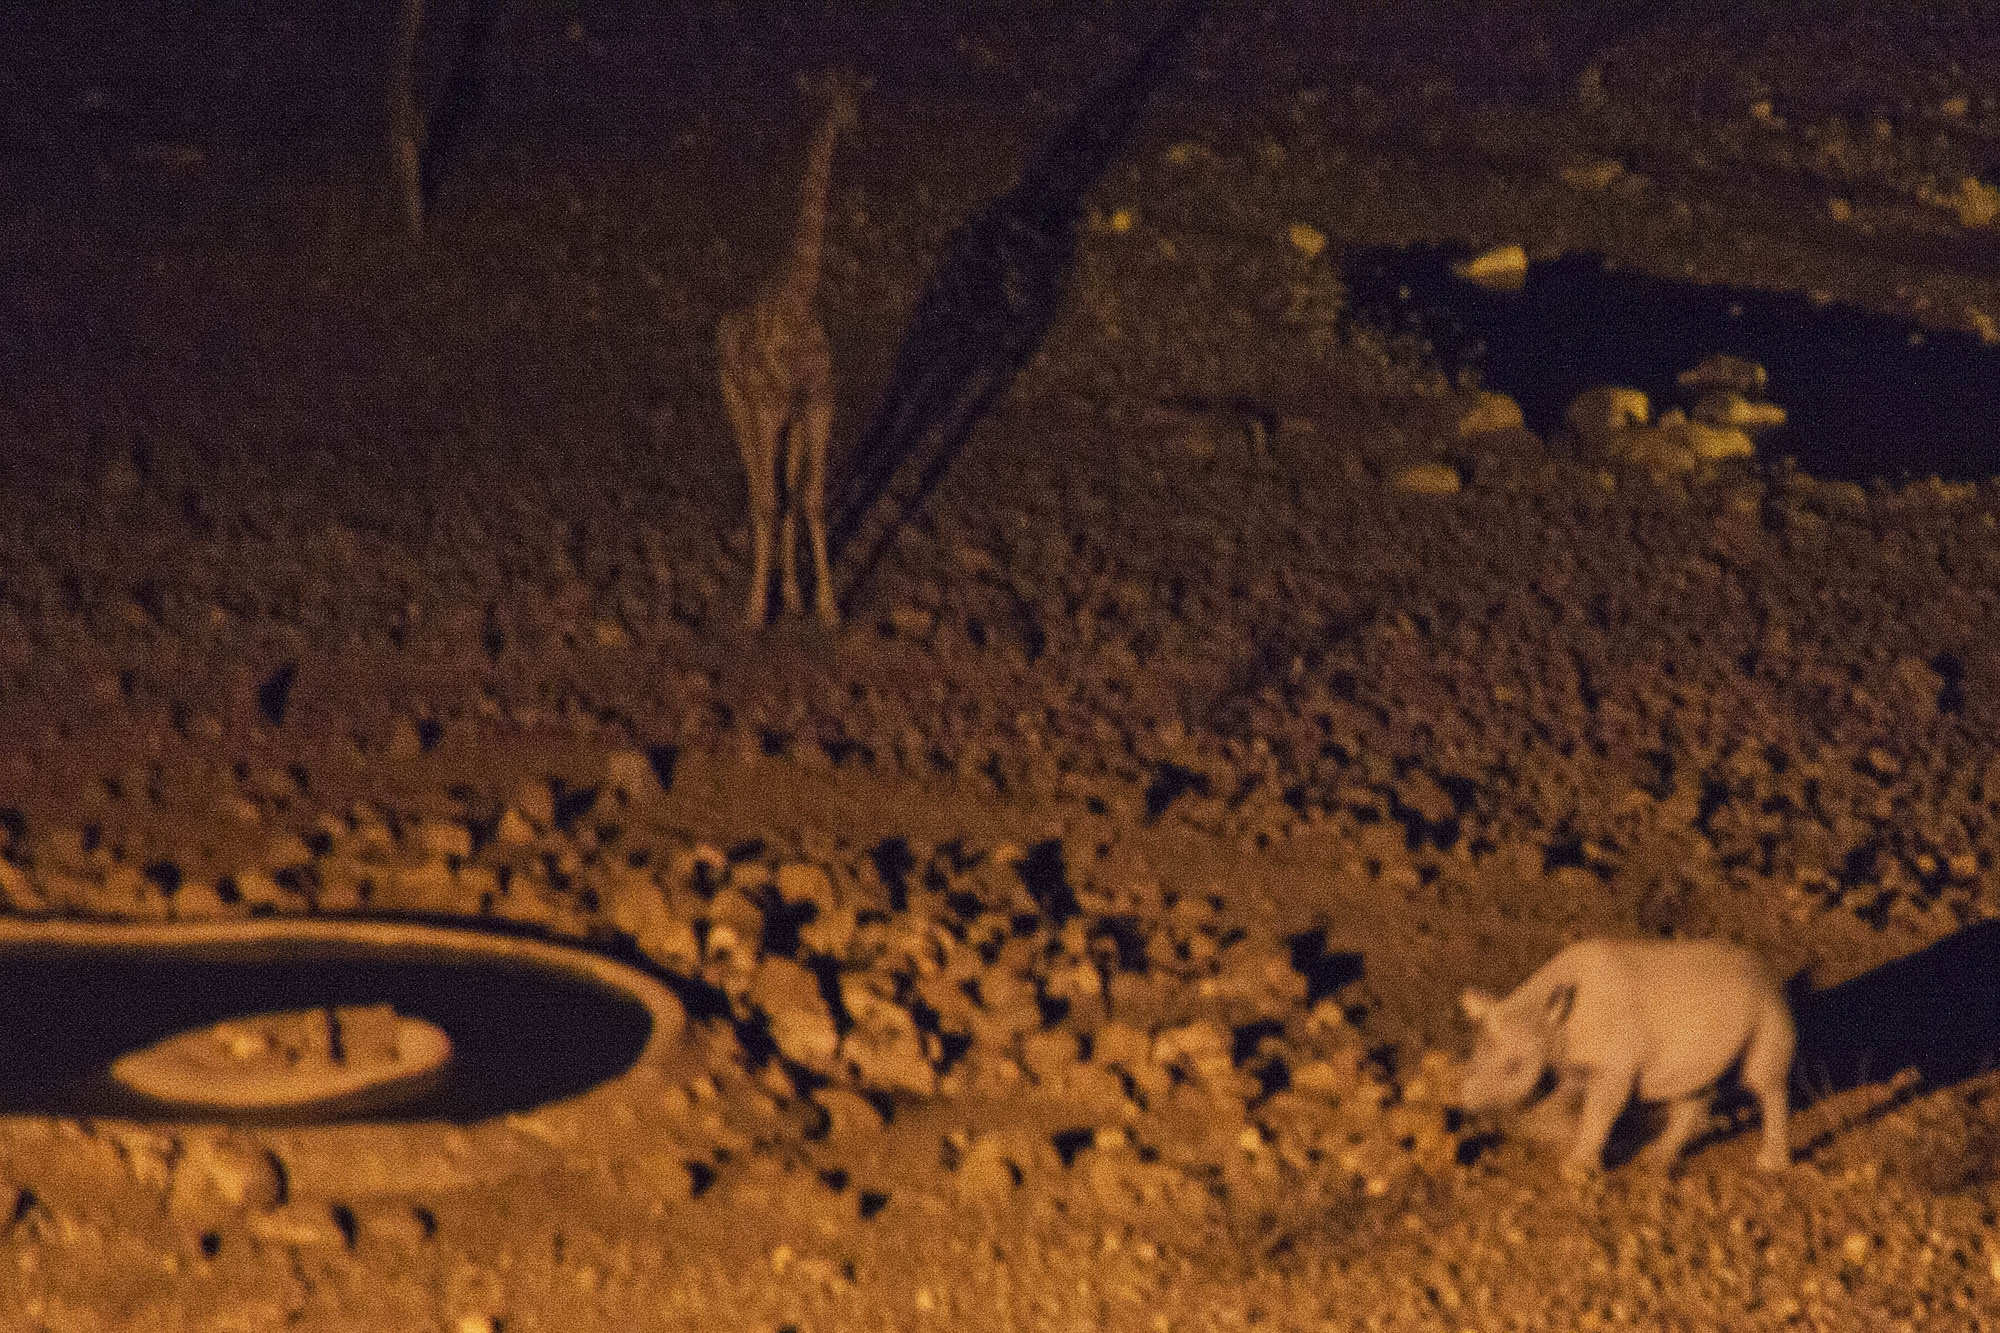 Rhino and Giraffe by the waterhole at night